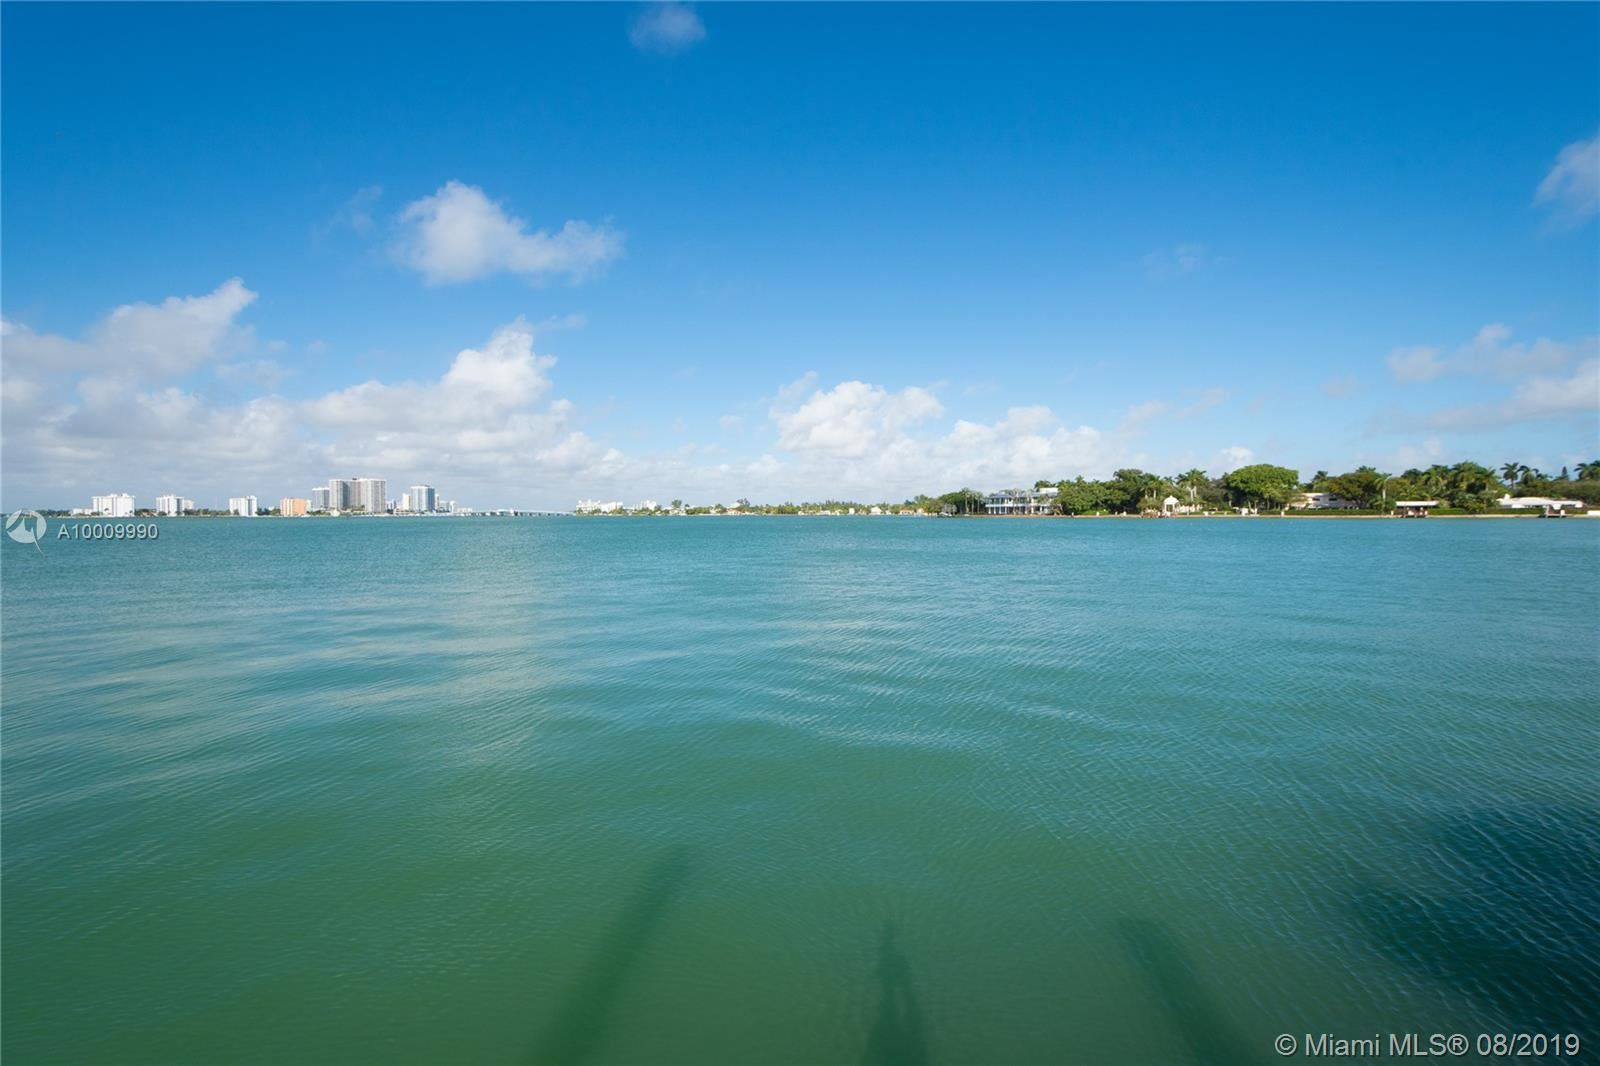 Photo 15 of Listing MLS a10009990 in 6050 N Bay Rd Miami Beach FL 33140